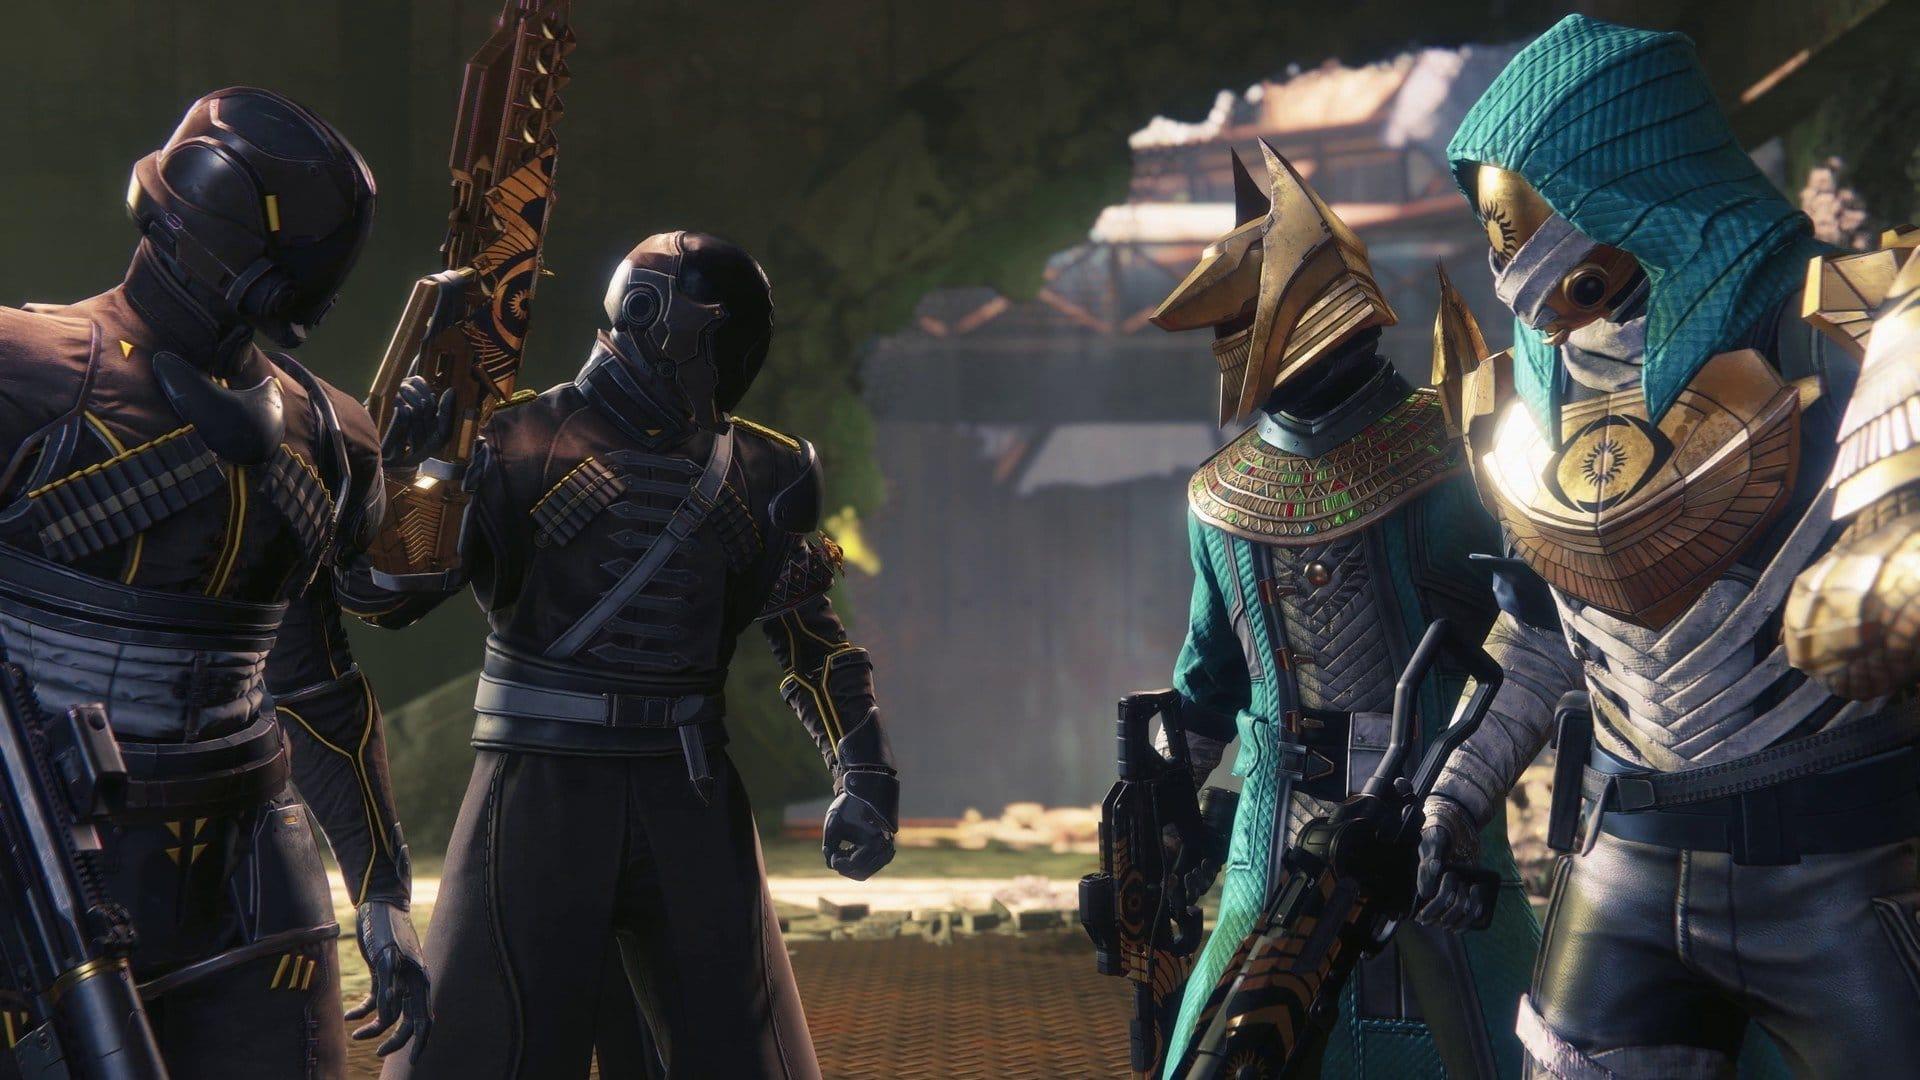 New Destiny 2 Trials of Osiris Rewards This Week September 24